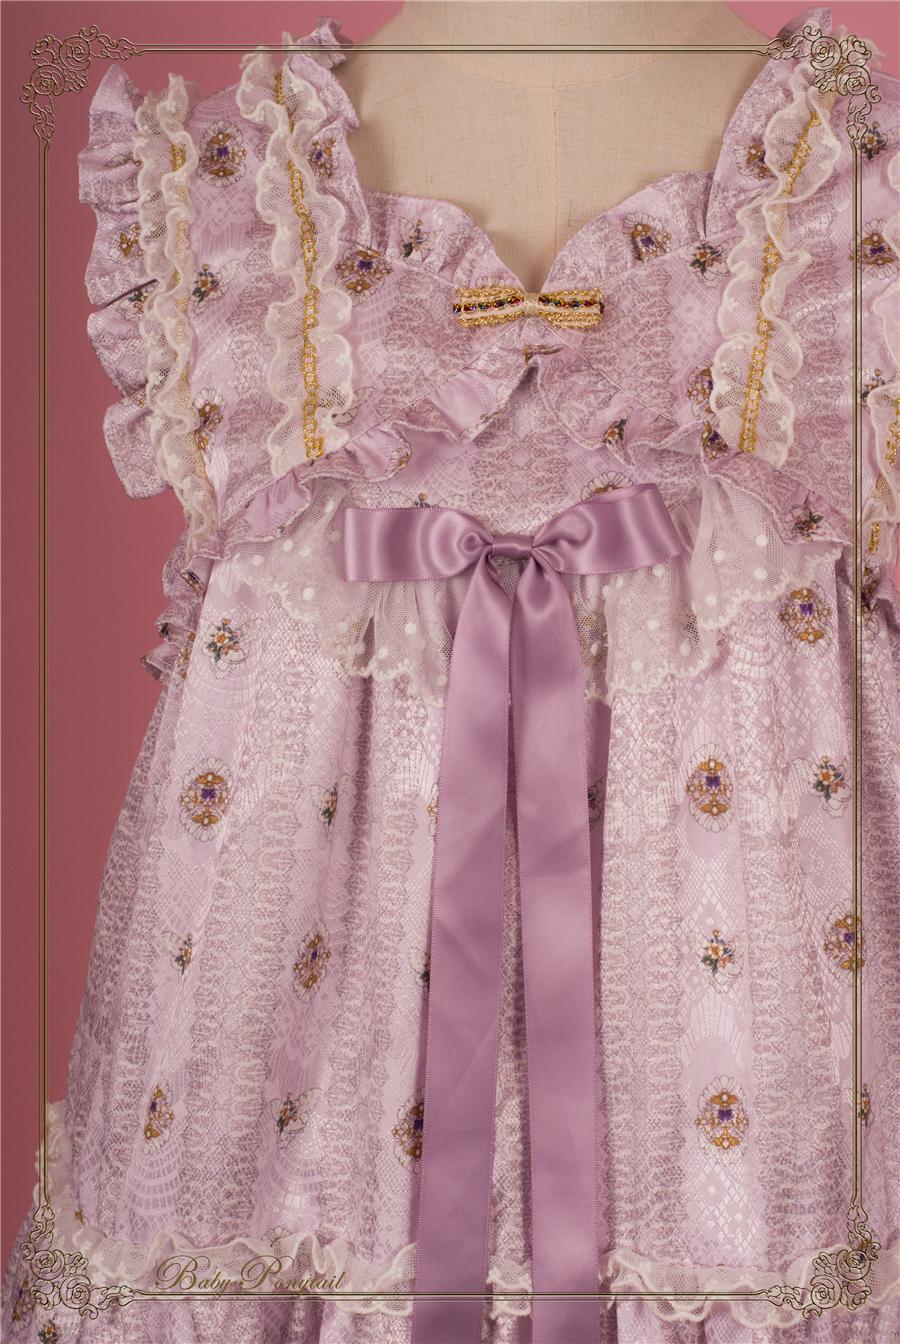 BabyPonytail_Stock Photo_My Favorite Companion_NG Lavender_1.jpg